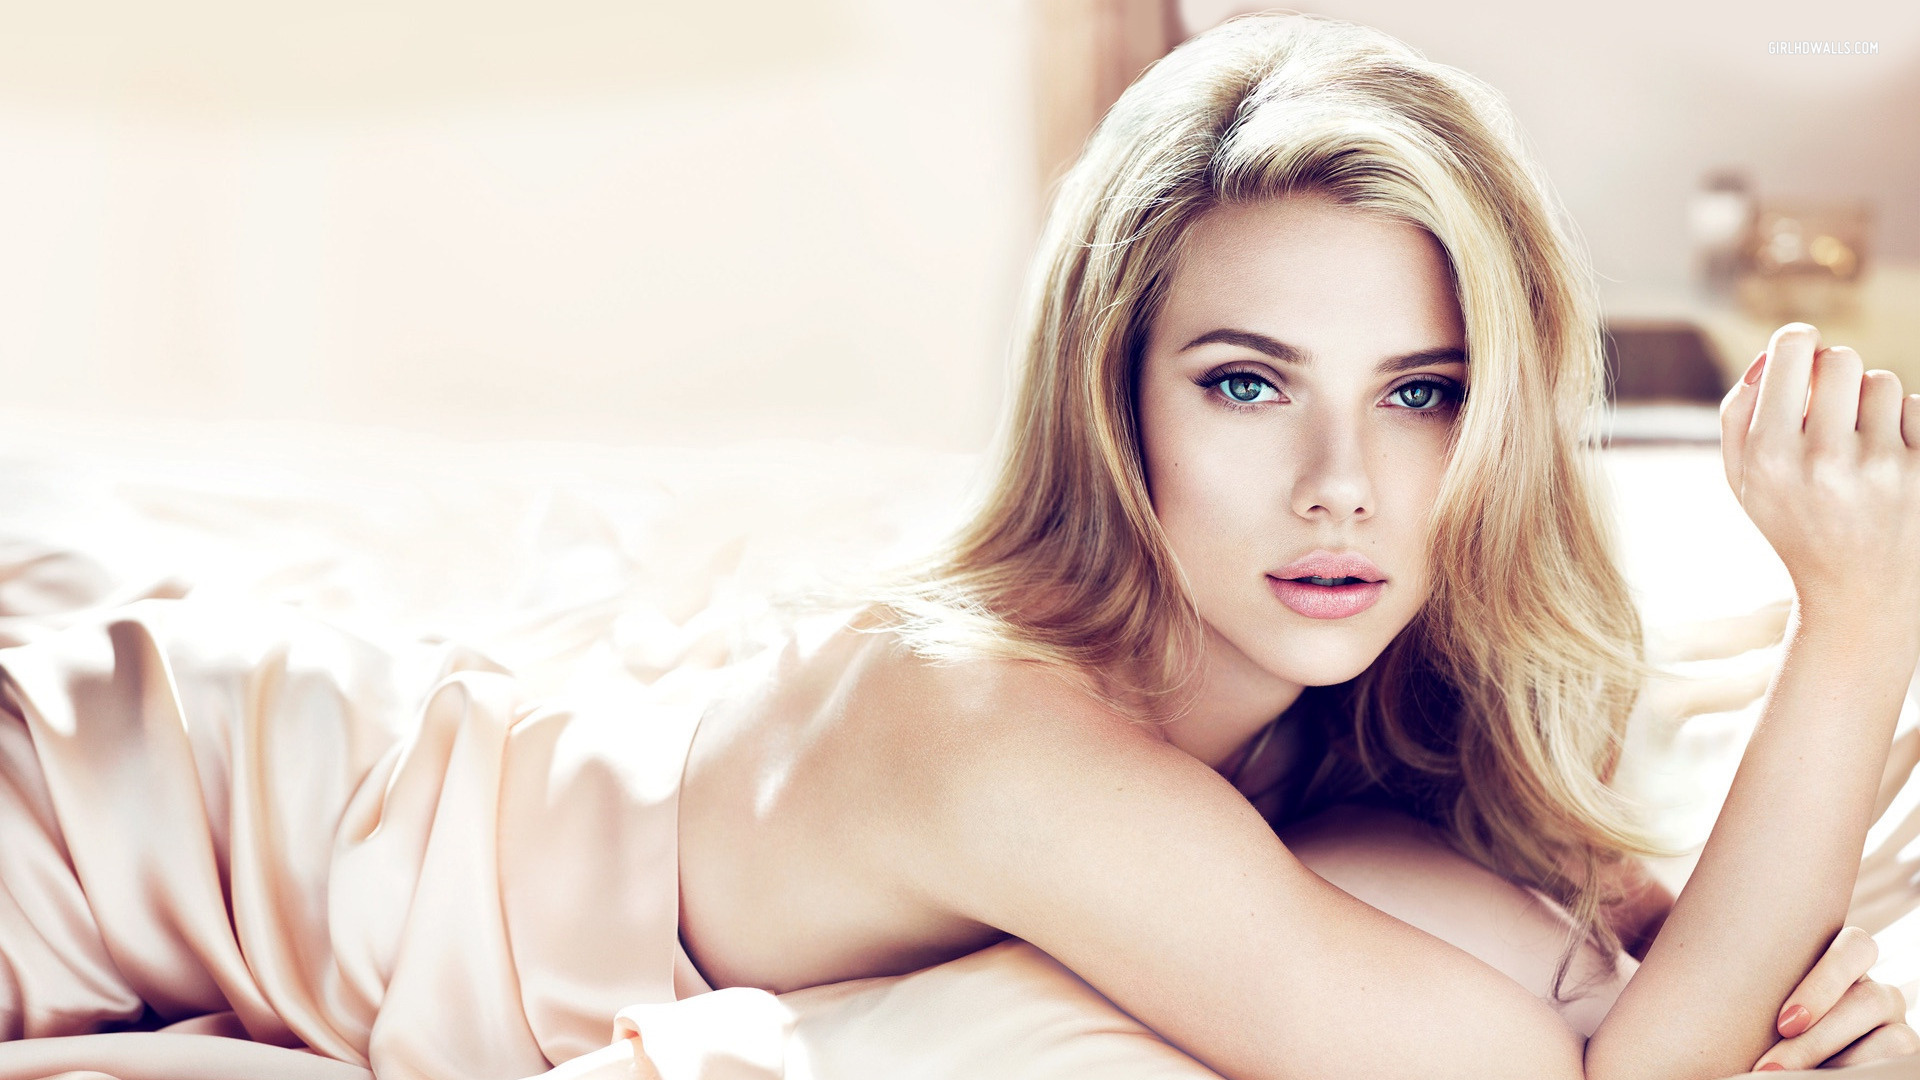 Sexiest Woman Alive  Scarlett Johansson   Mr  Conservative HD Wallpaper